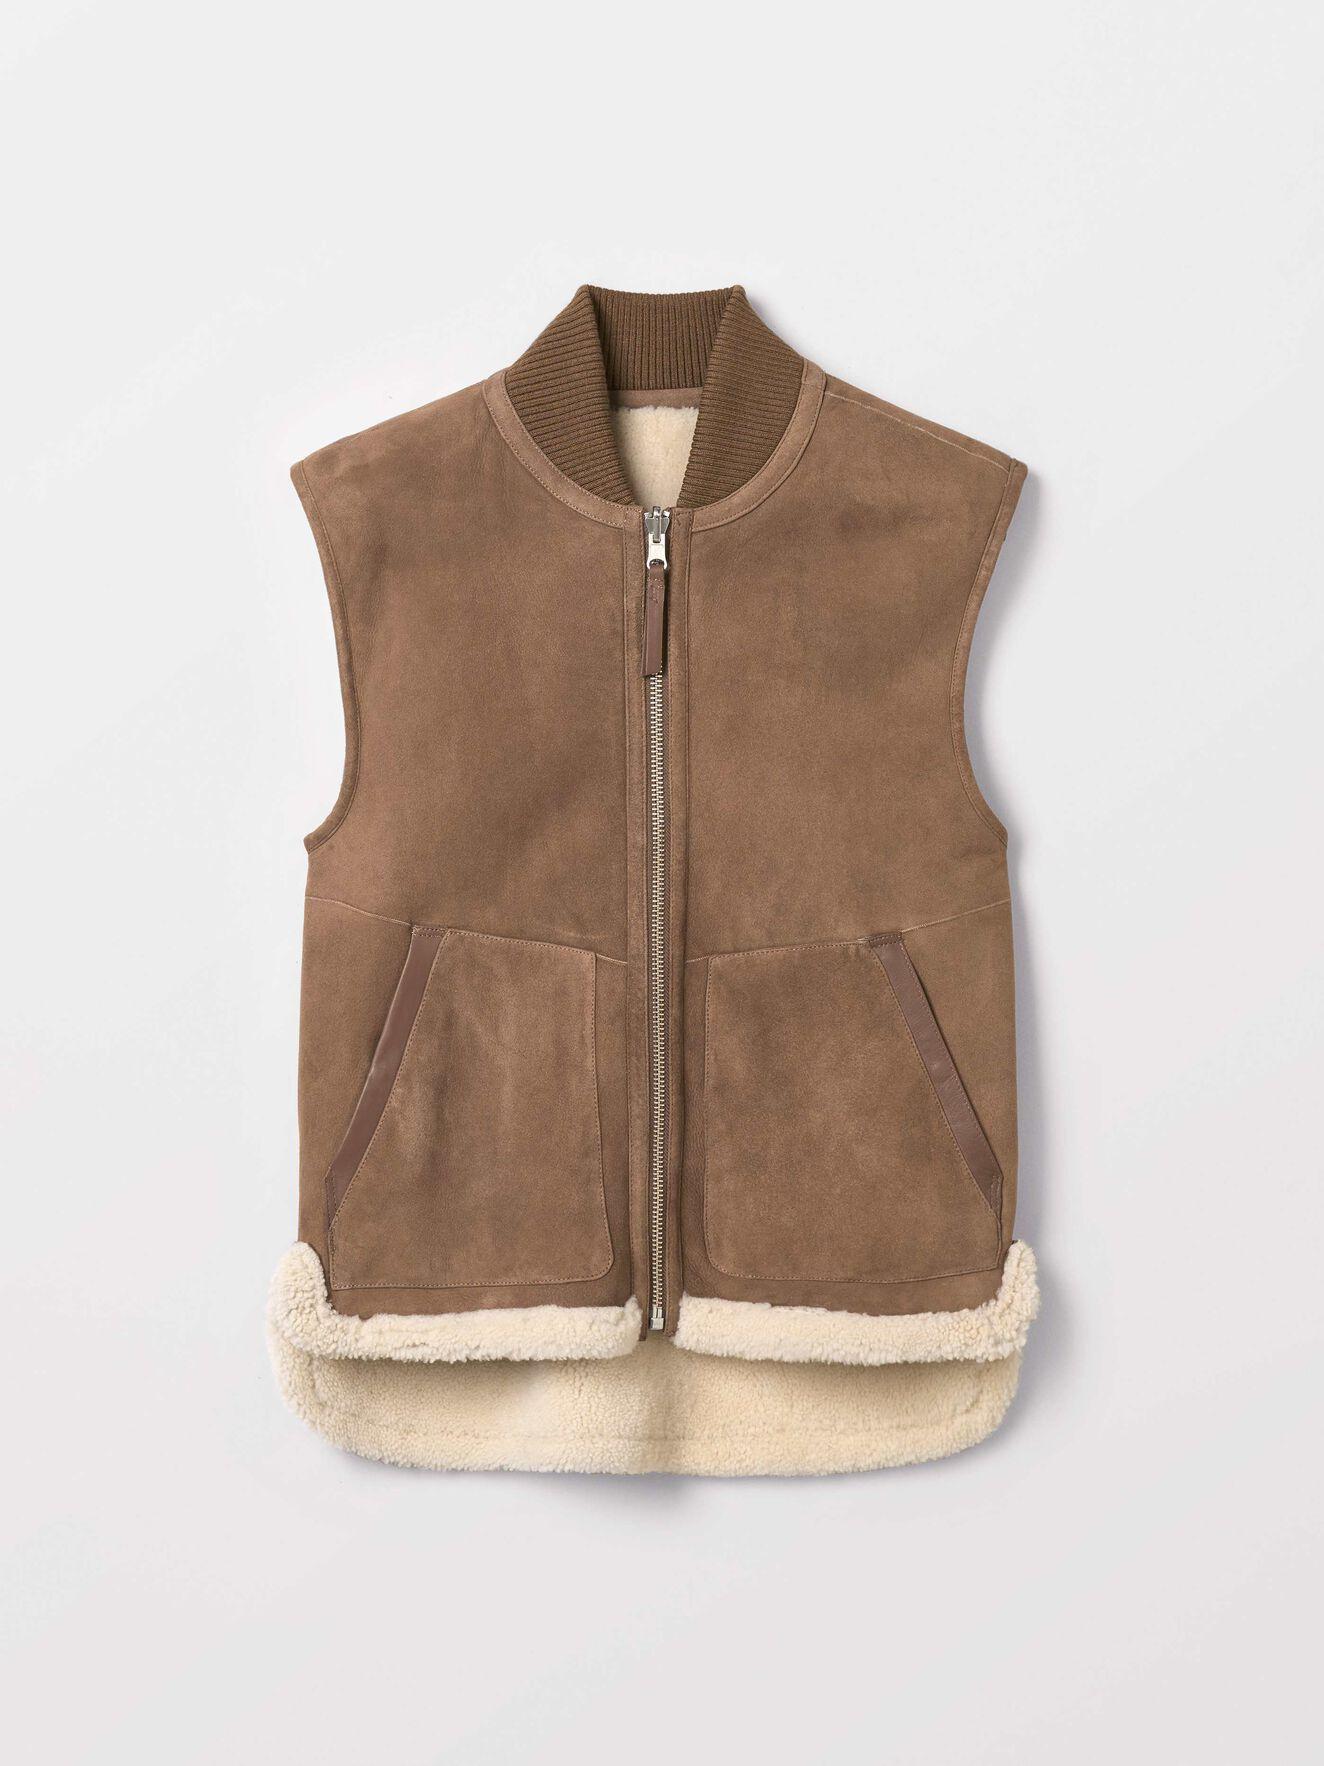 Lamir Vest in Dark Honey from Tiger of Sweden